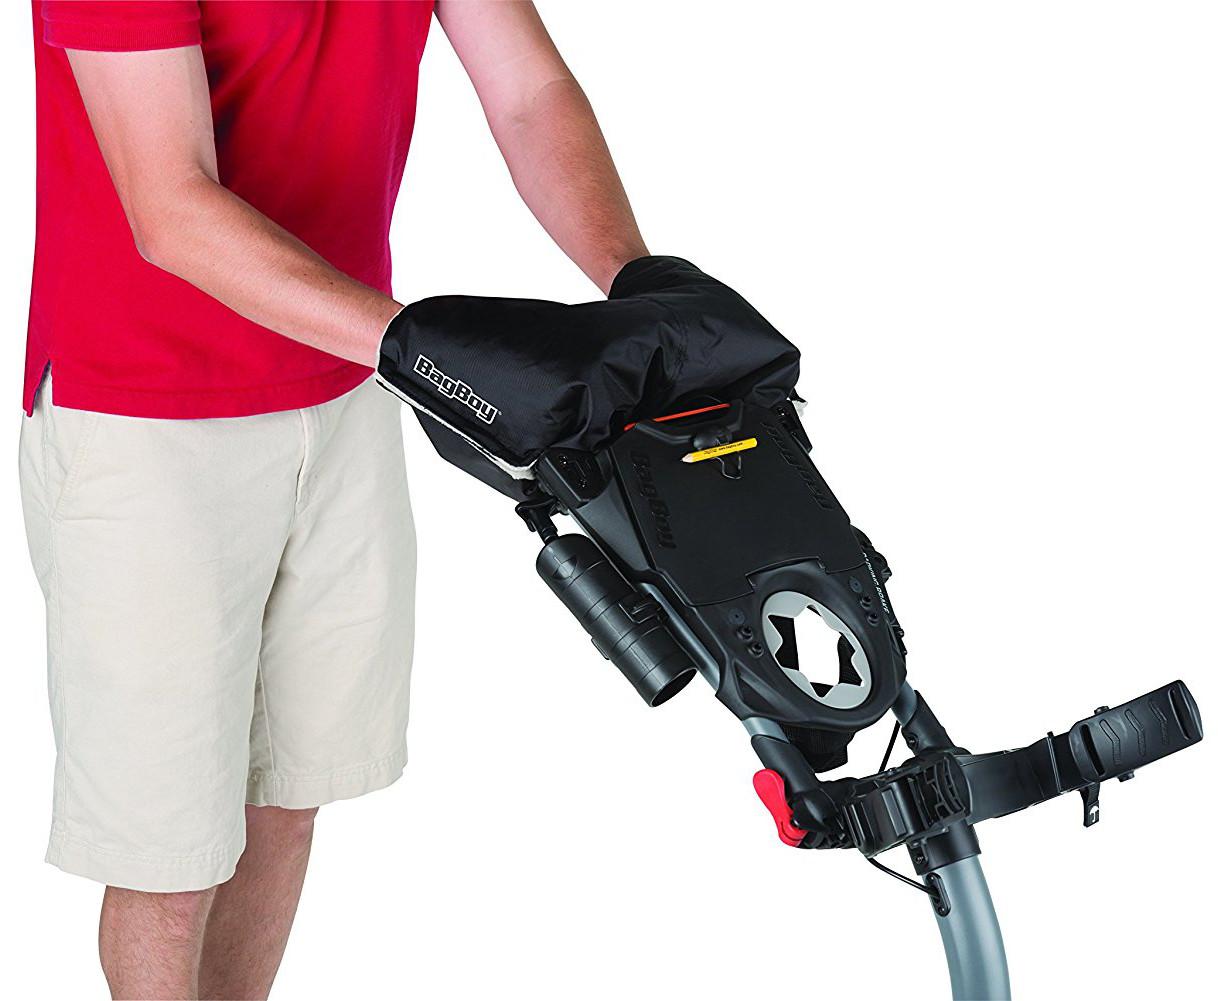 Bag Boy Golf Cart Accessory Hand Warmers